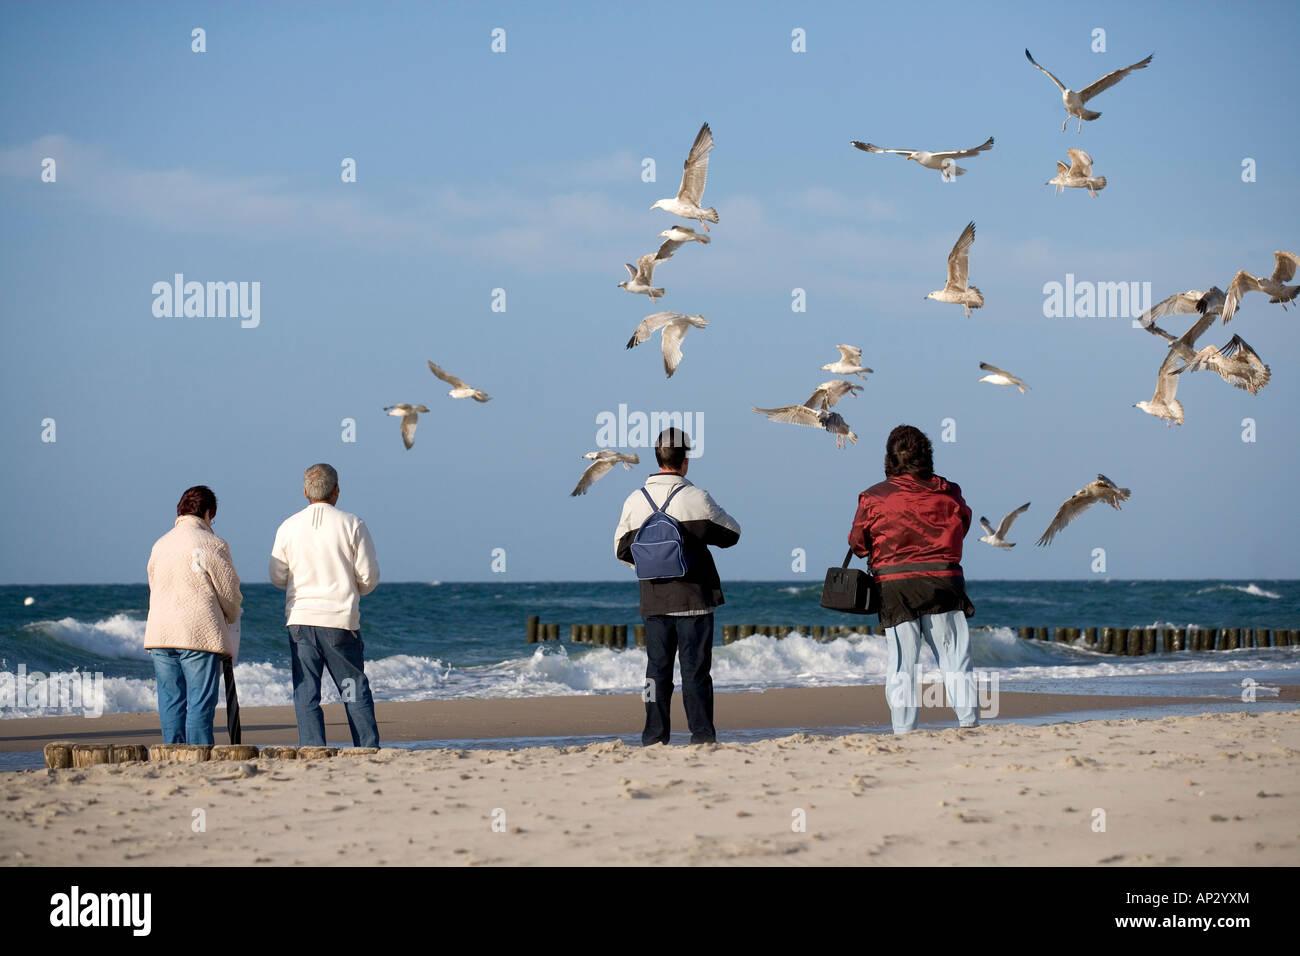 Seagull, Baltic Sea, Mecklenburg-Western Pomerania, Germany - Stock Image